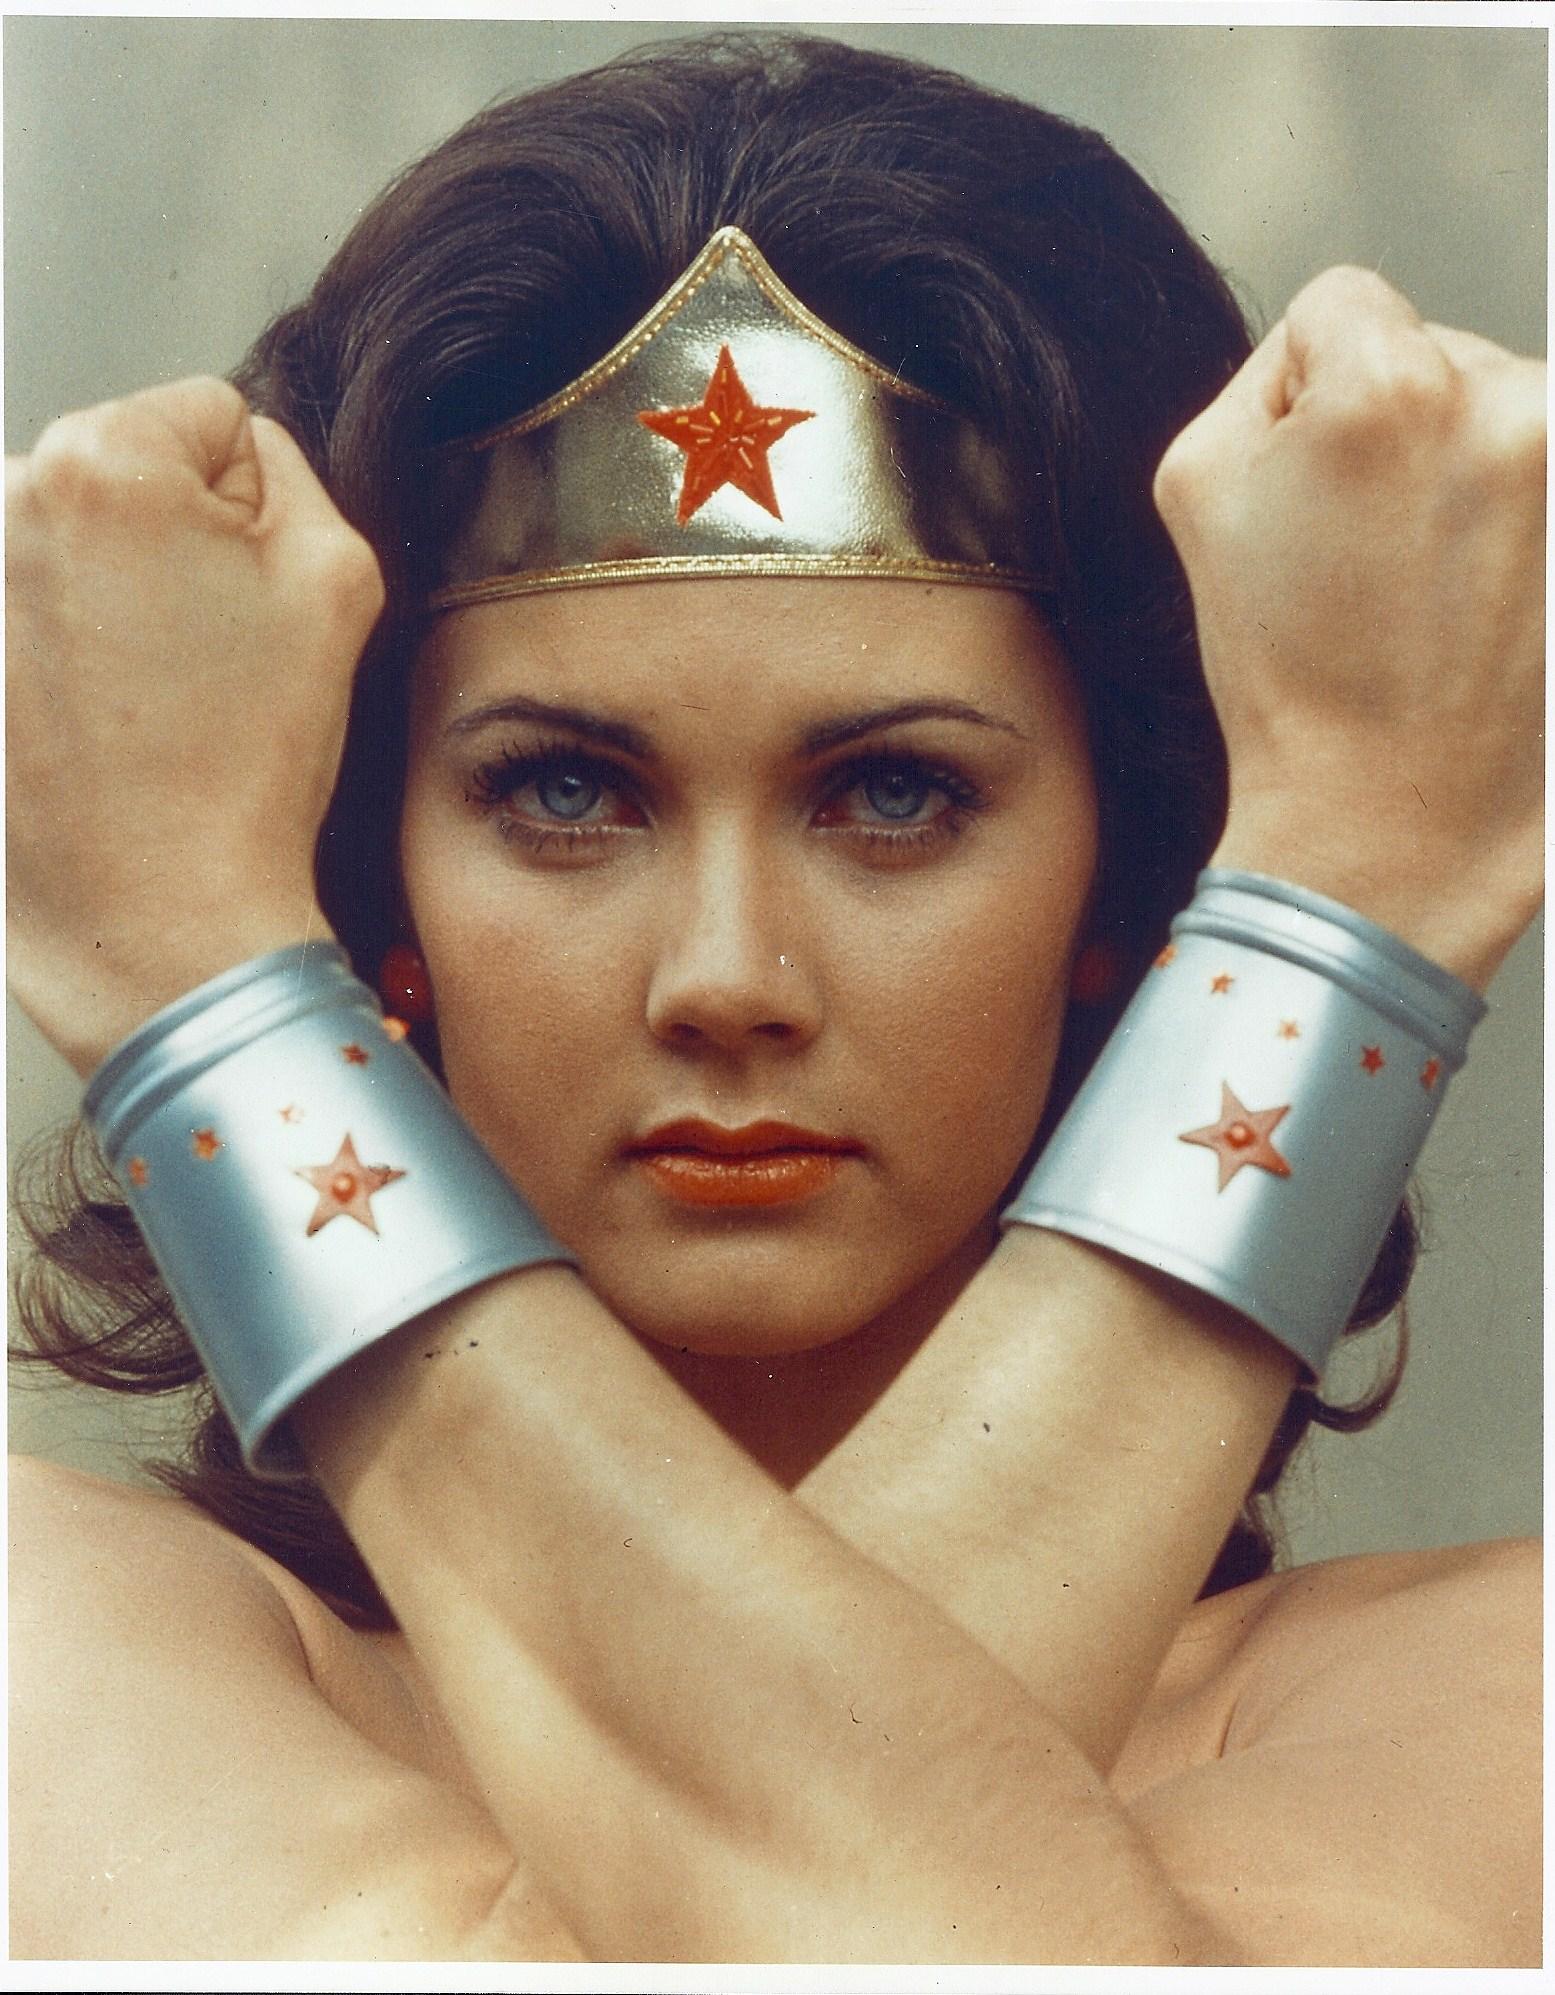 WONDER WOMAN 1975 promo